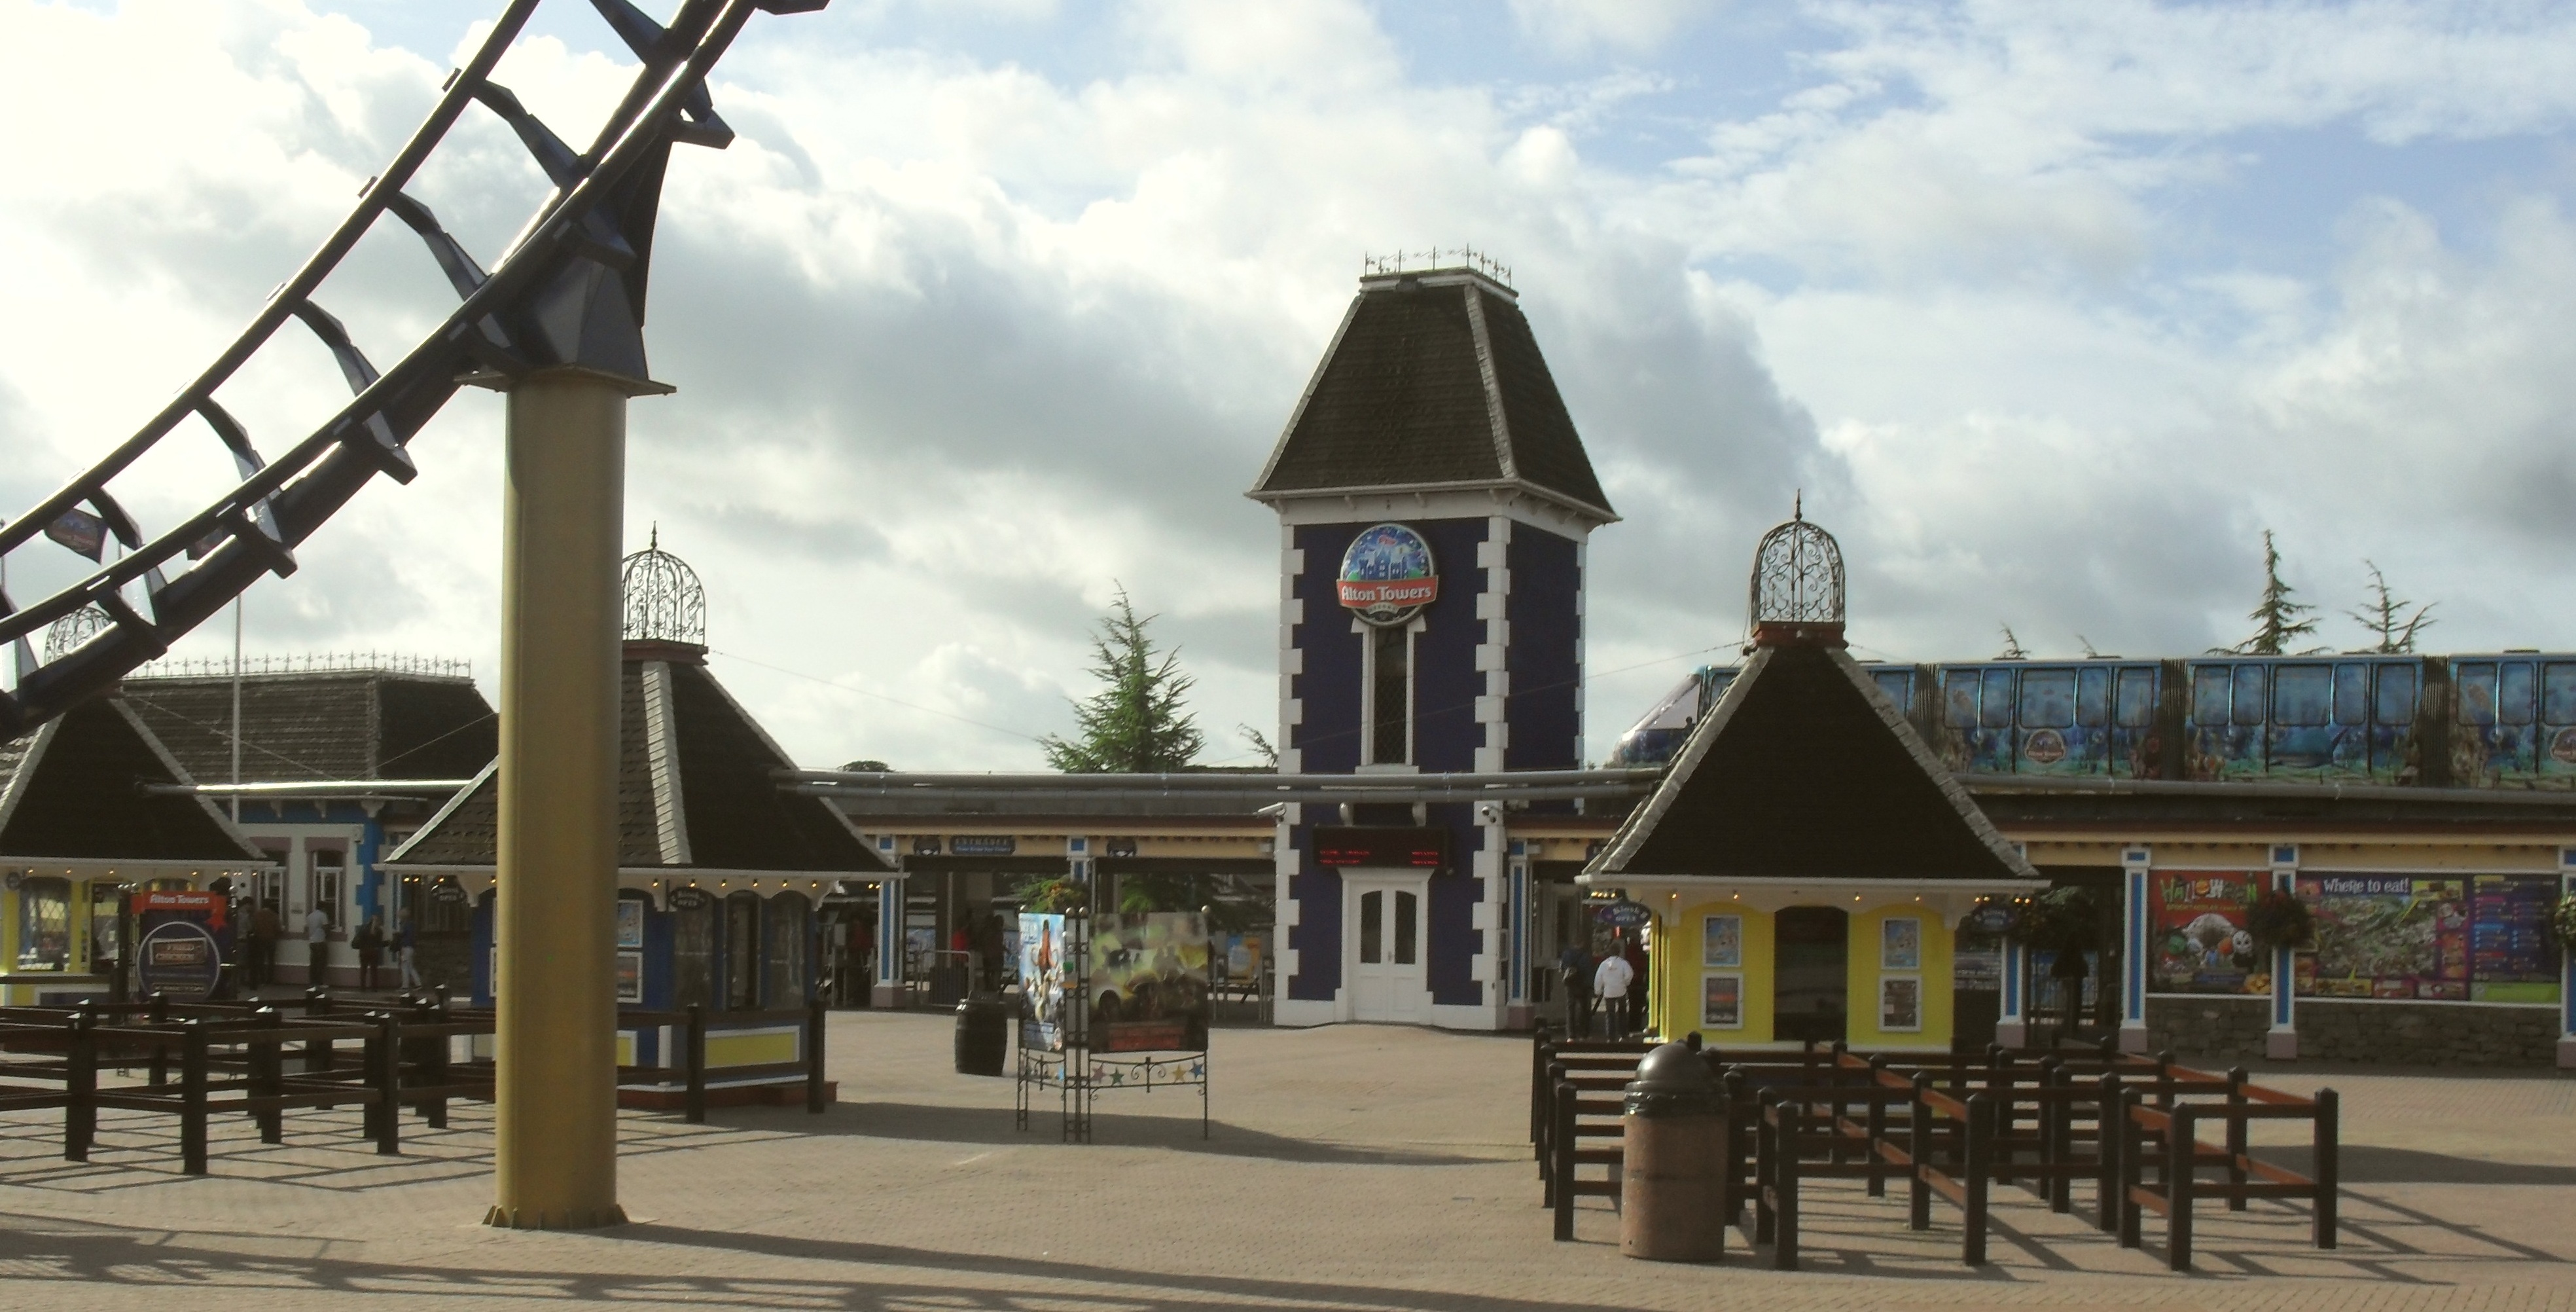 Nottingham theme park